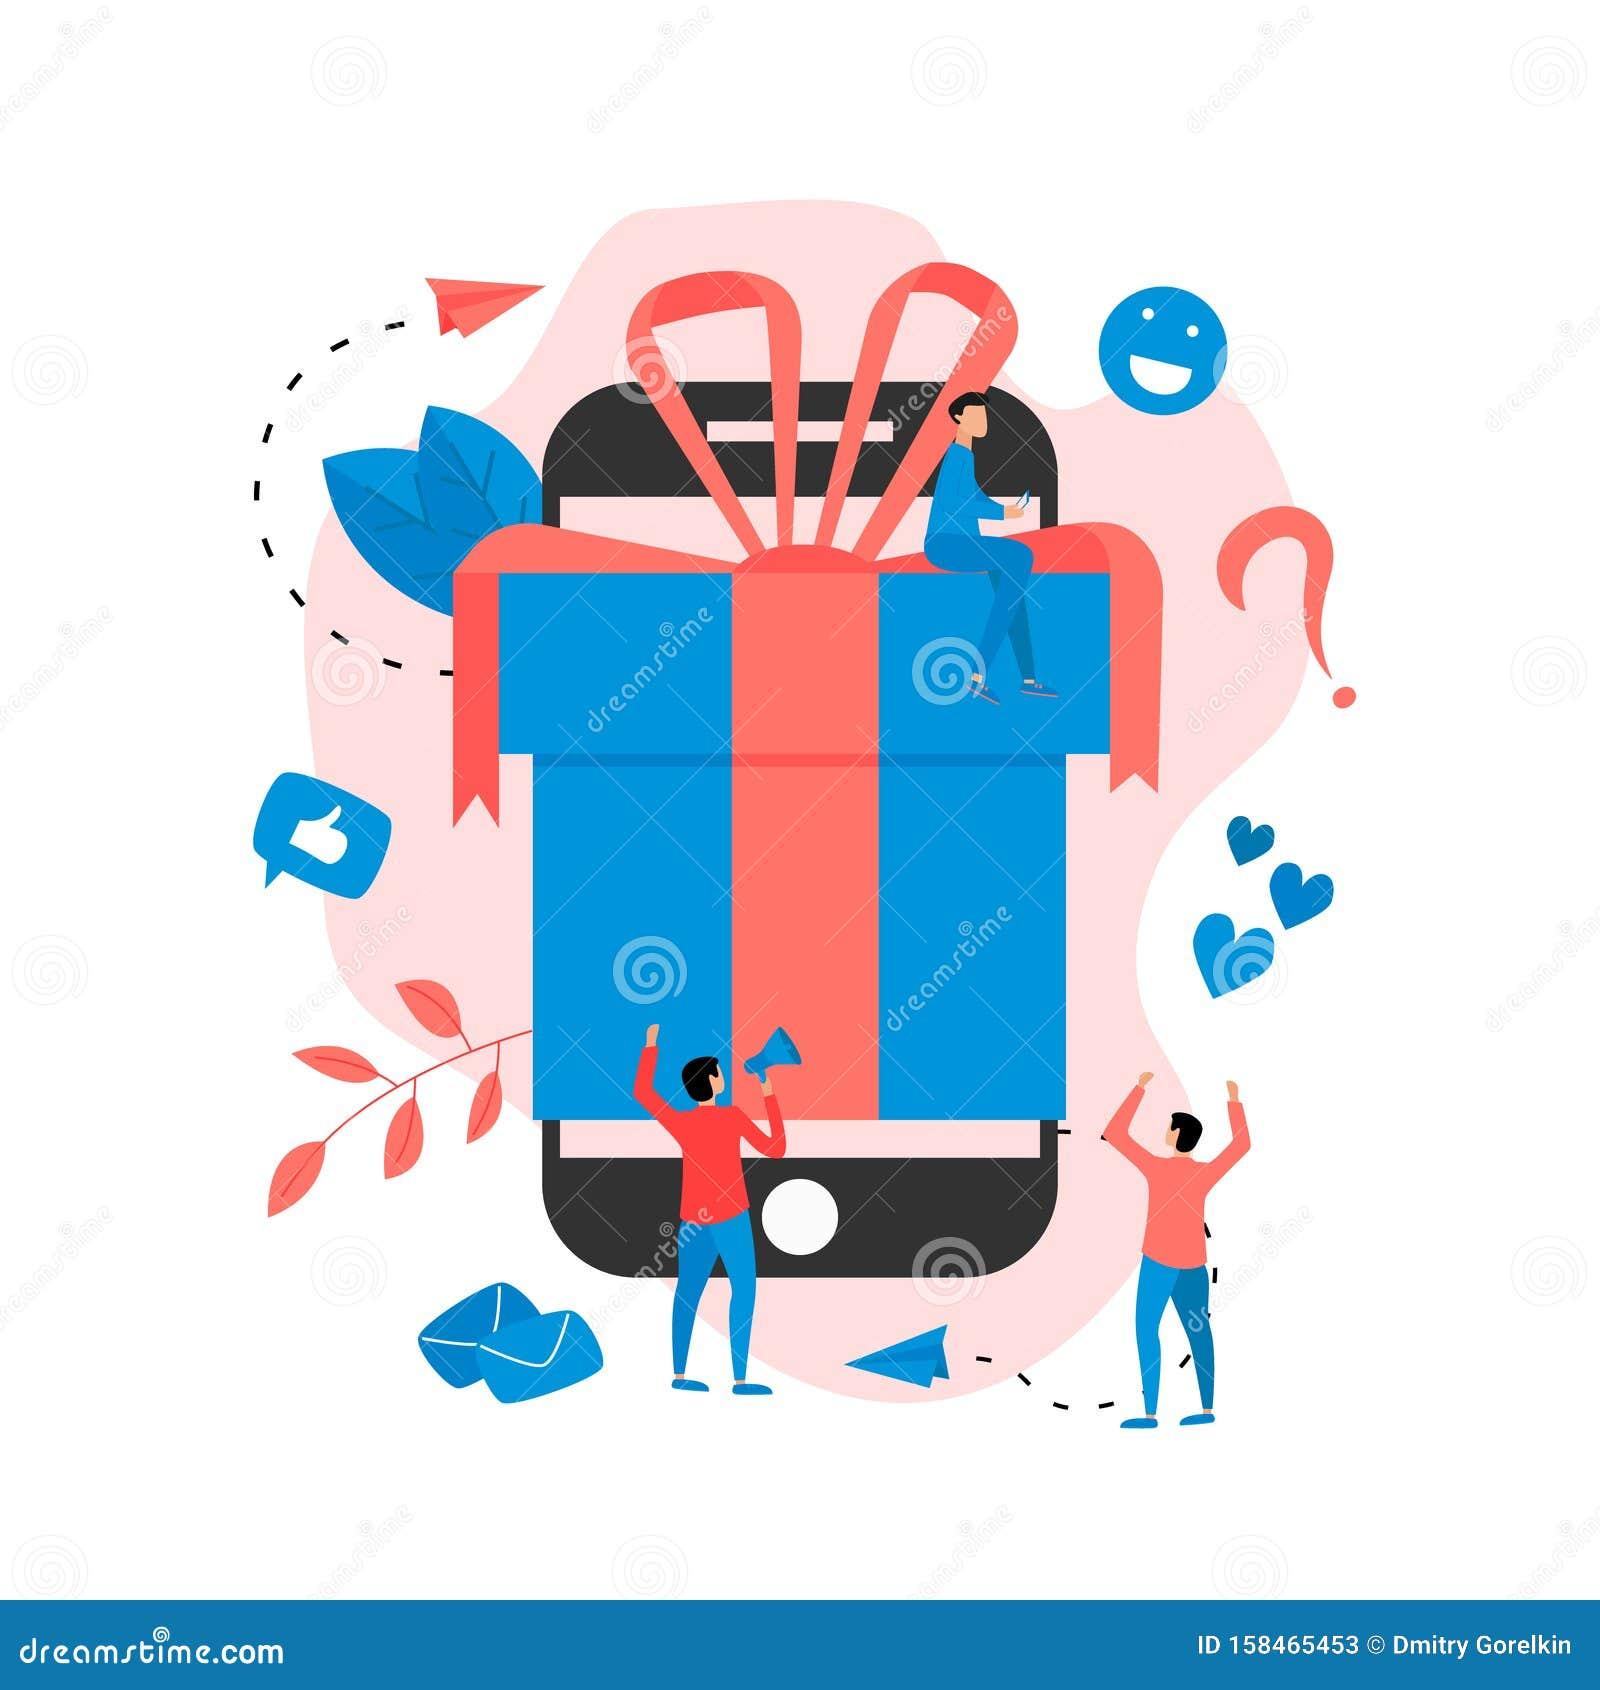 Online gift box. Promotion of online store or shop loyalty program and bonus. Vector illustration for advertisement